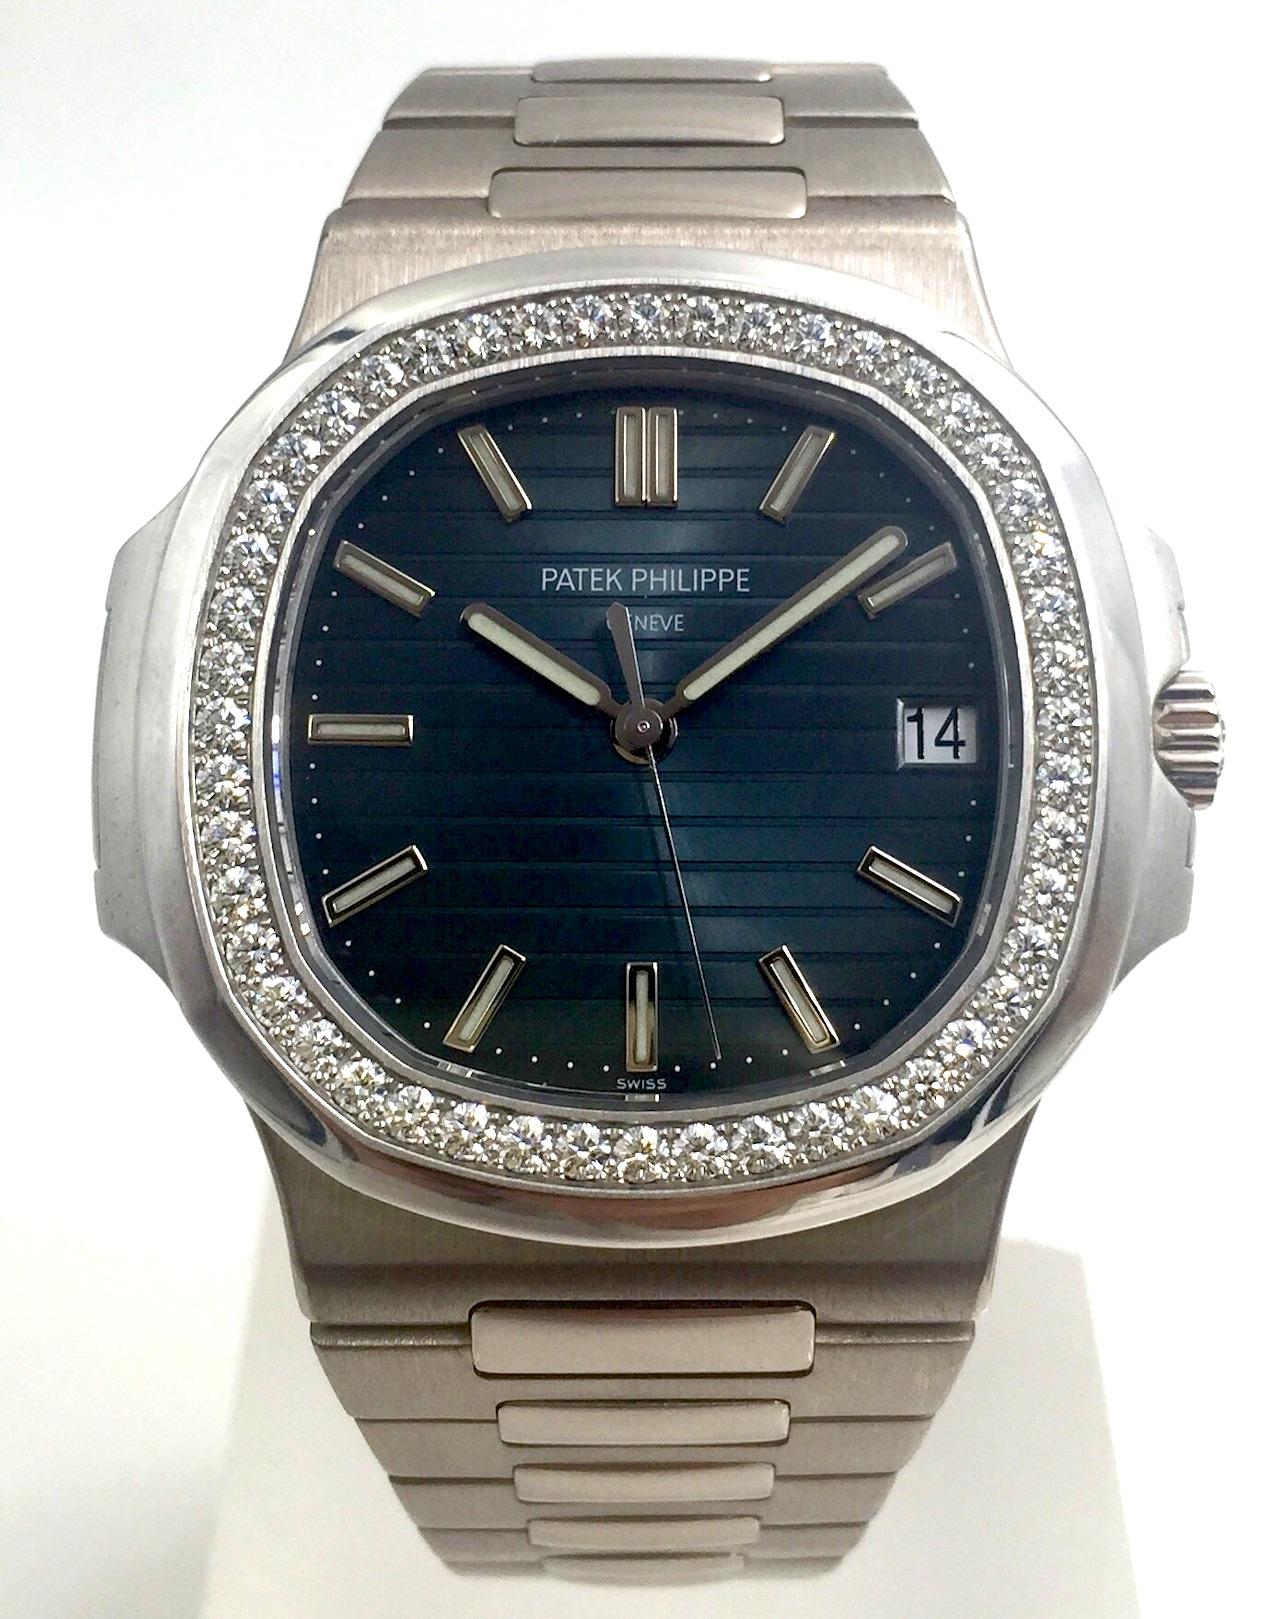 Patek Philippe Nautilus White Gold With Diamonds Ref 5713